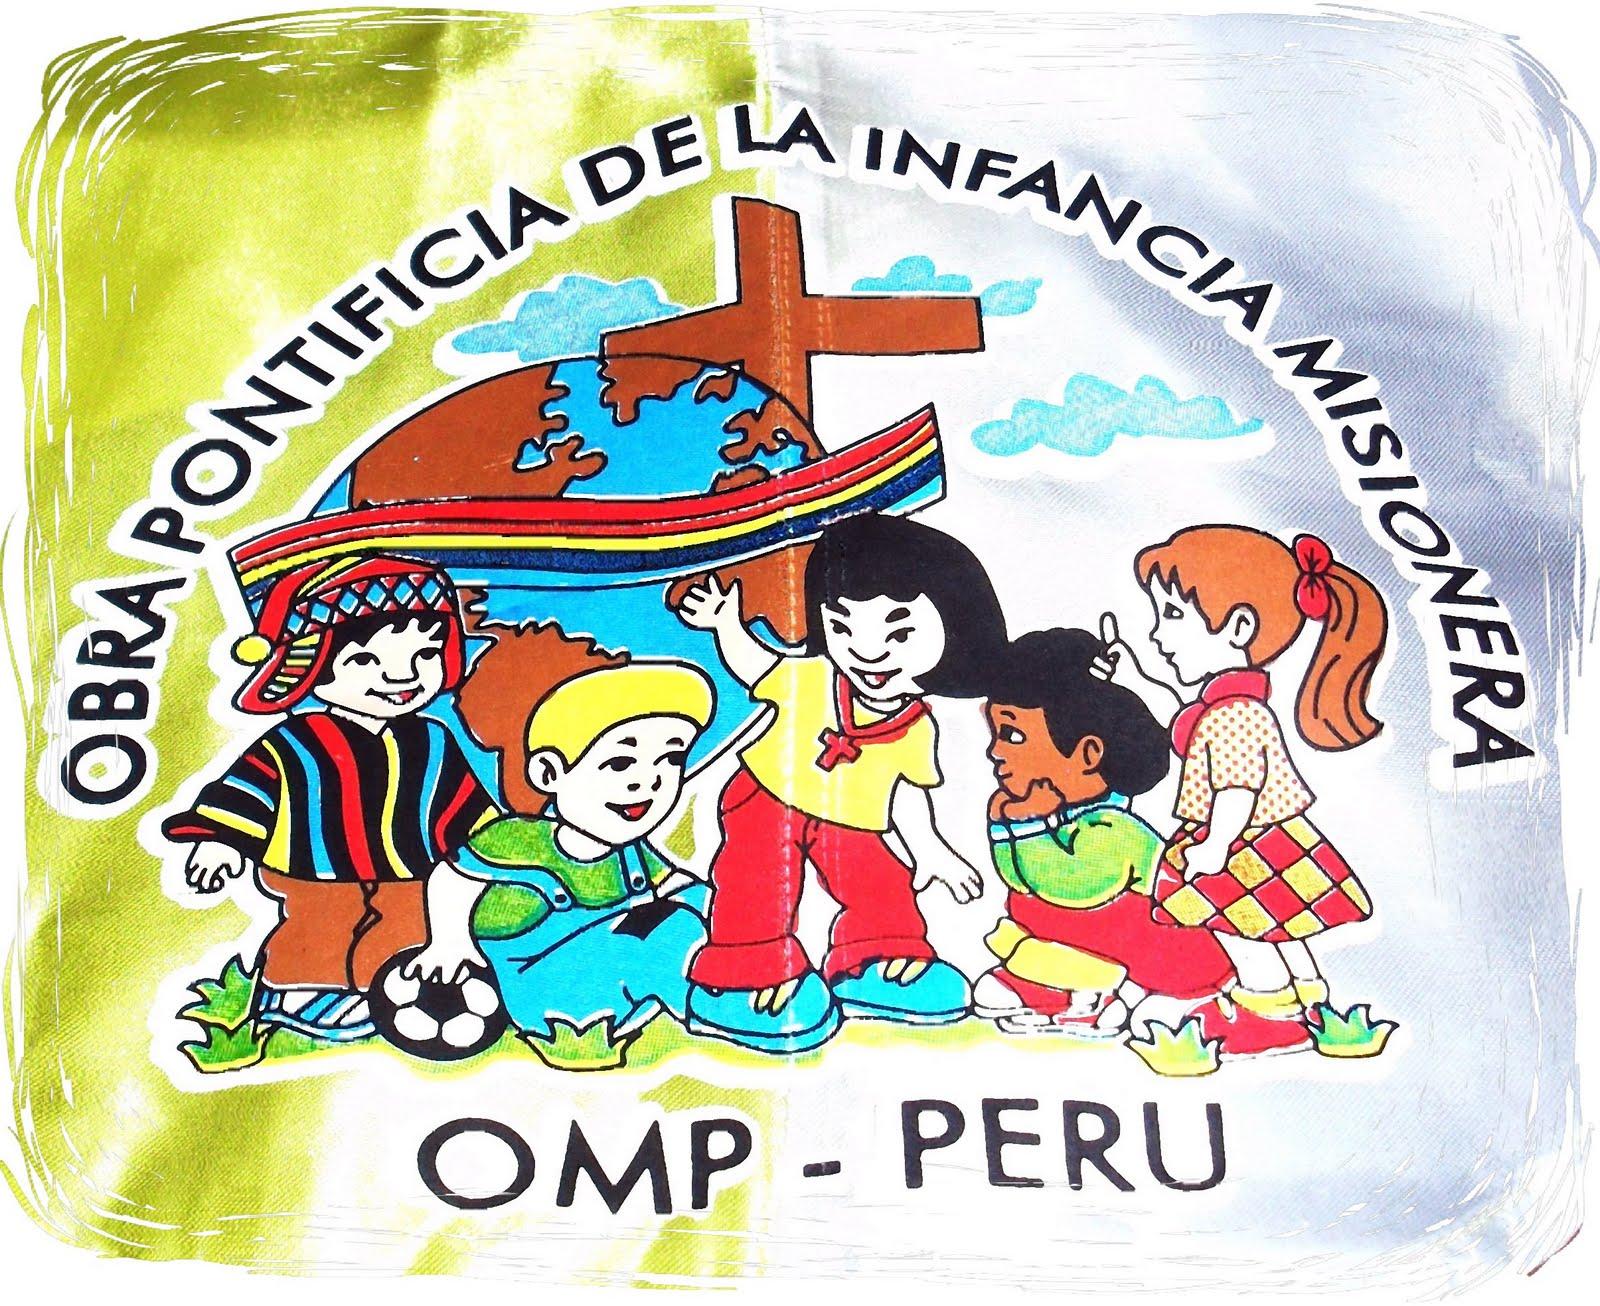 poesias cristianas misioneras